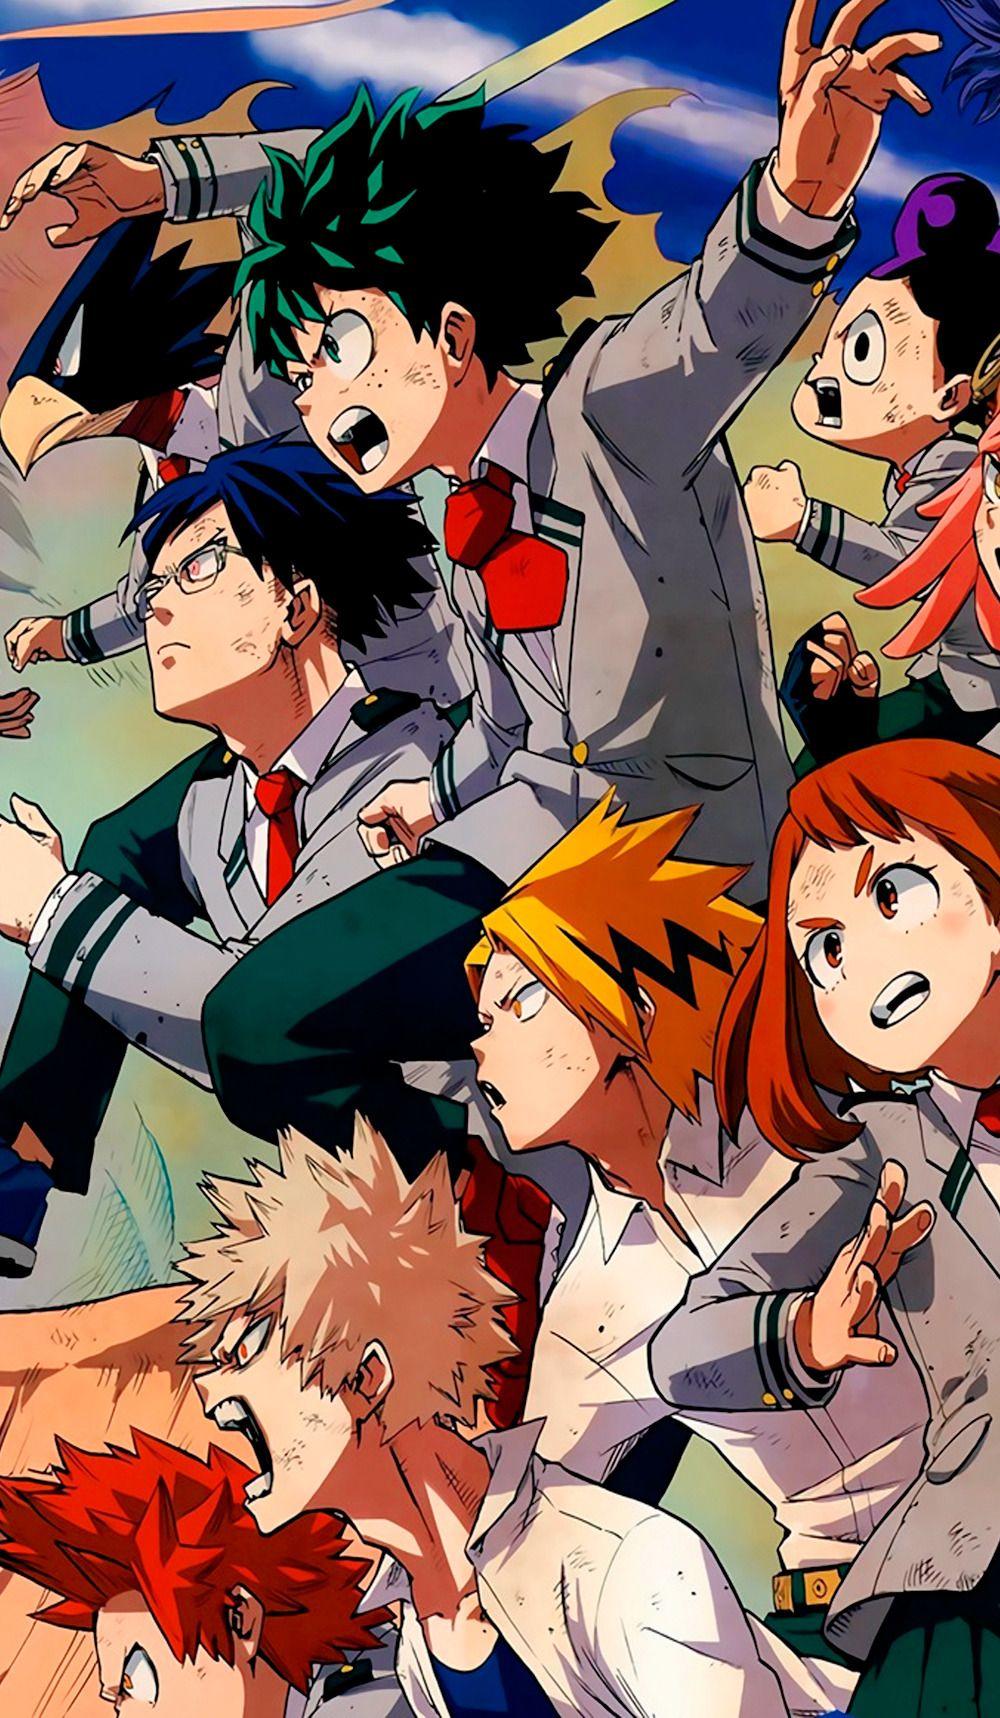 Anime Lockscreen Tumblr Anime Wallpaper Iphone Cute Cartoon Wallpapers Anime